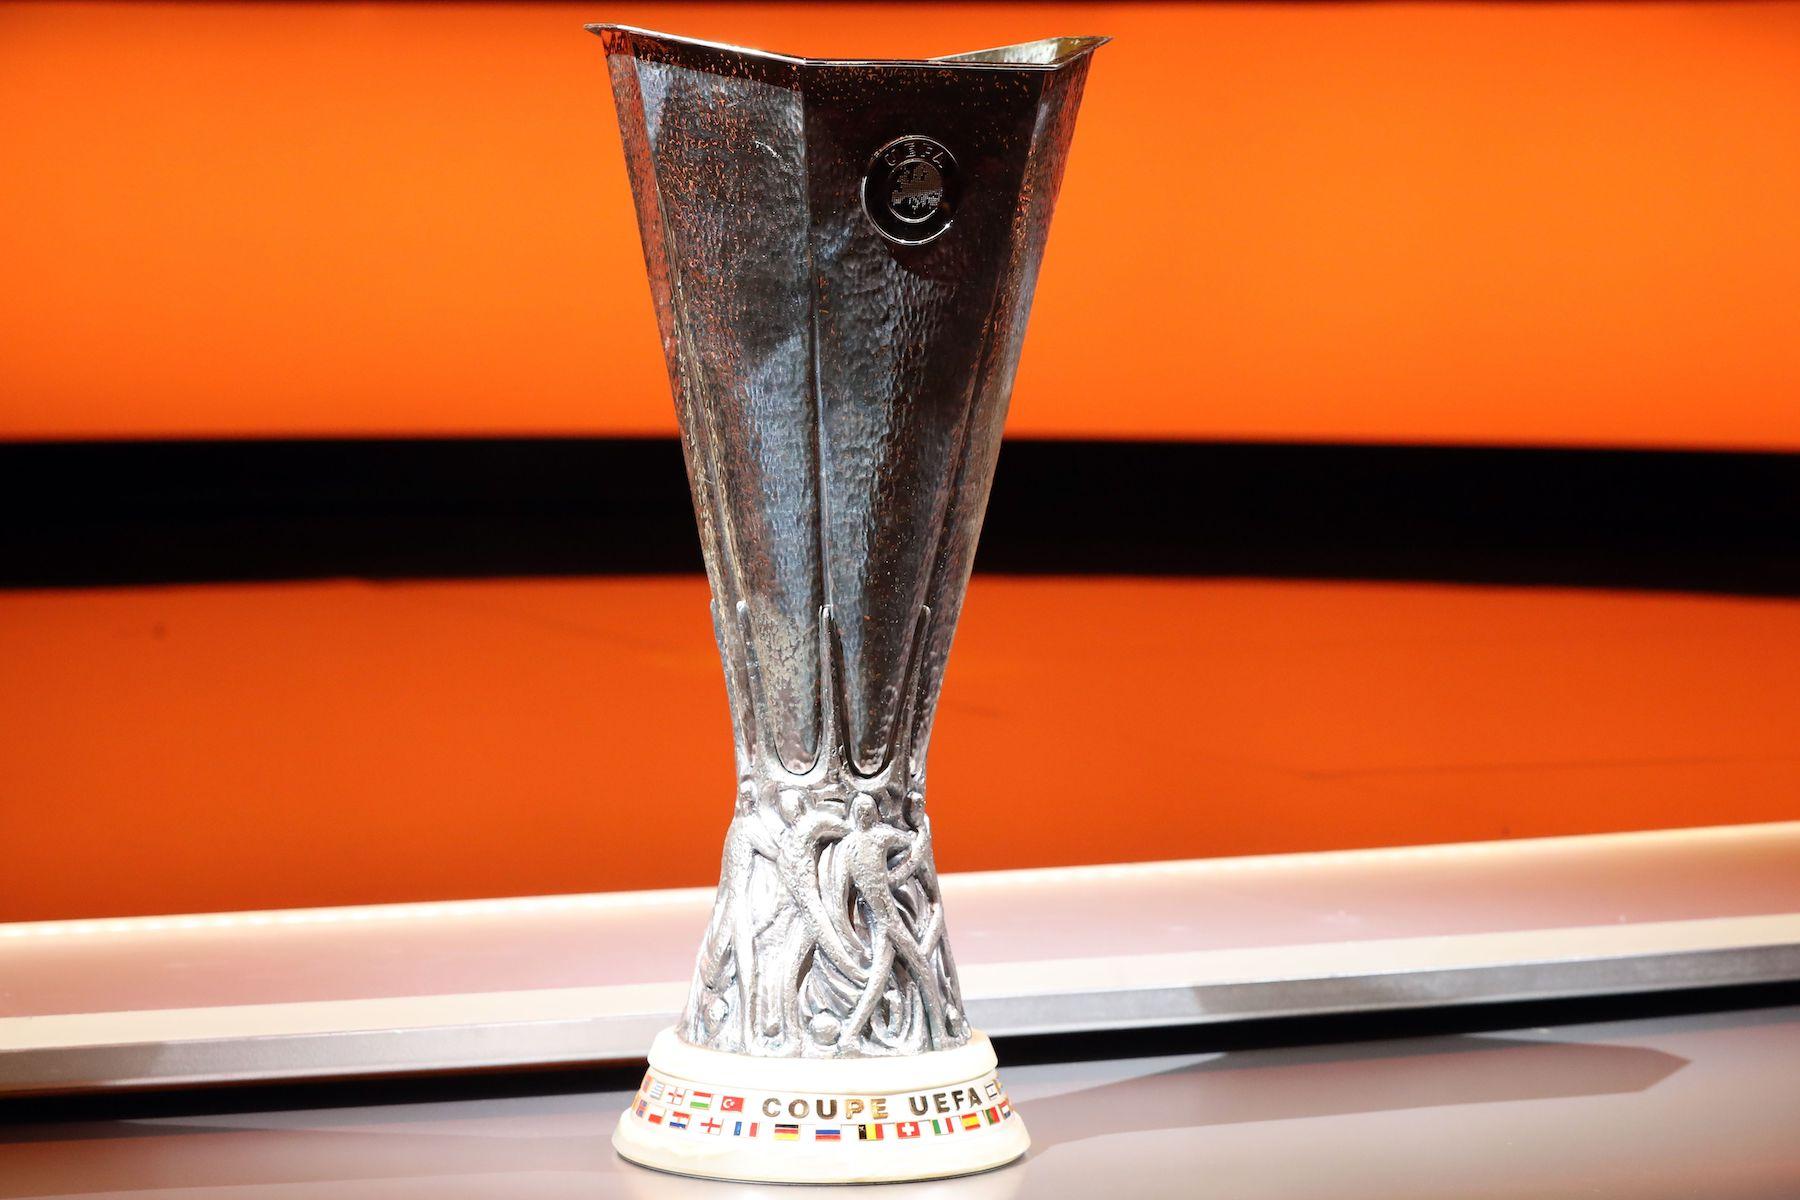 Should PSG Focus on the Europa League? - PSG Talk